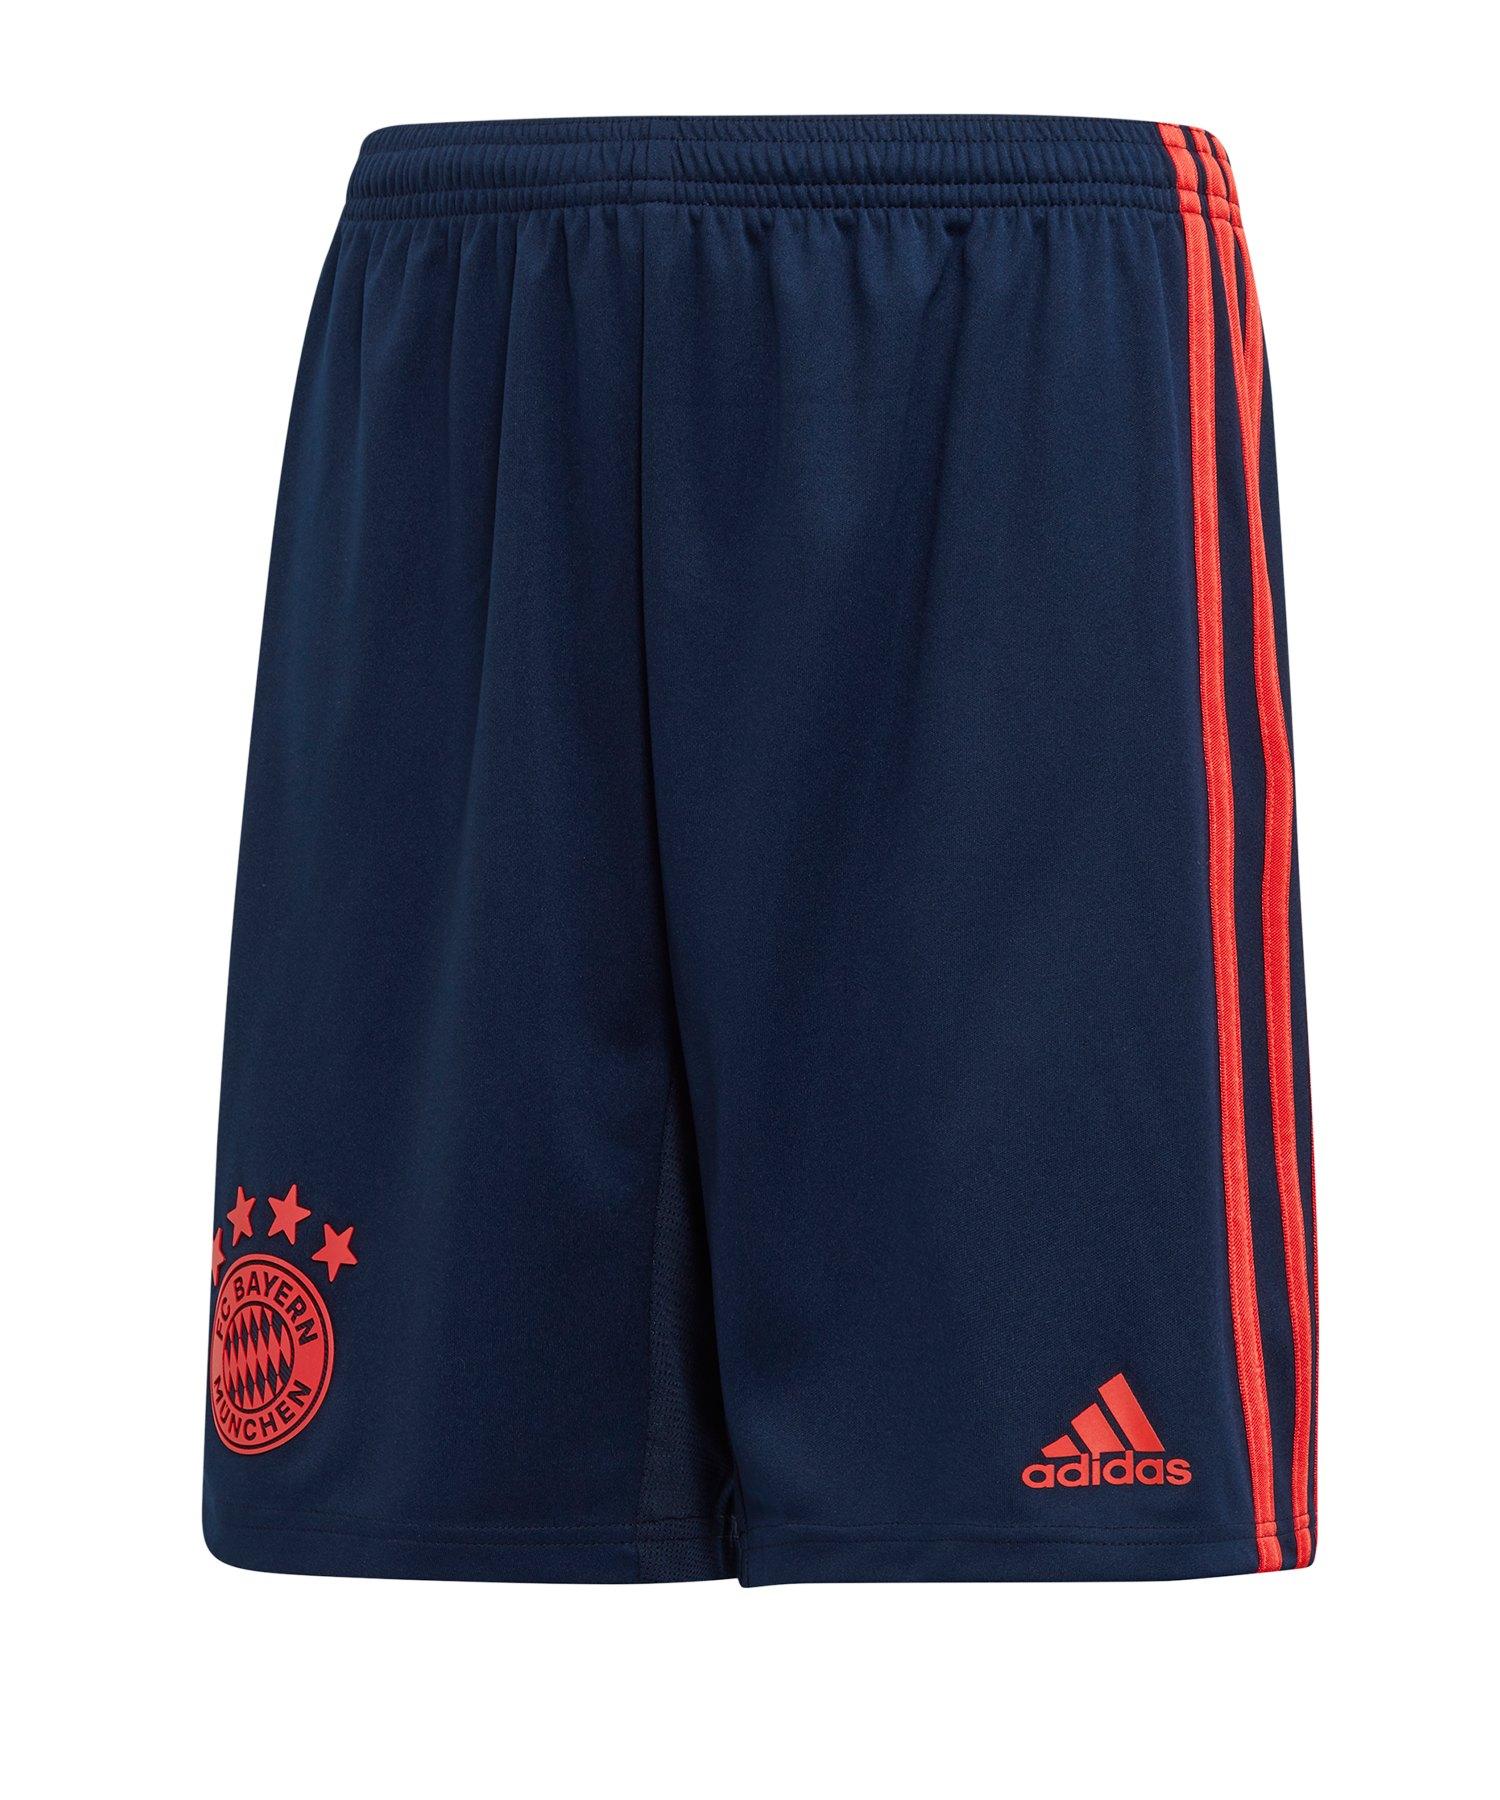 adidas FC Bayern München Short UCL 2019/2020 Kids - blau